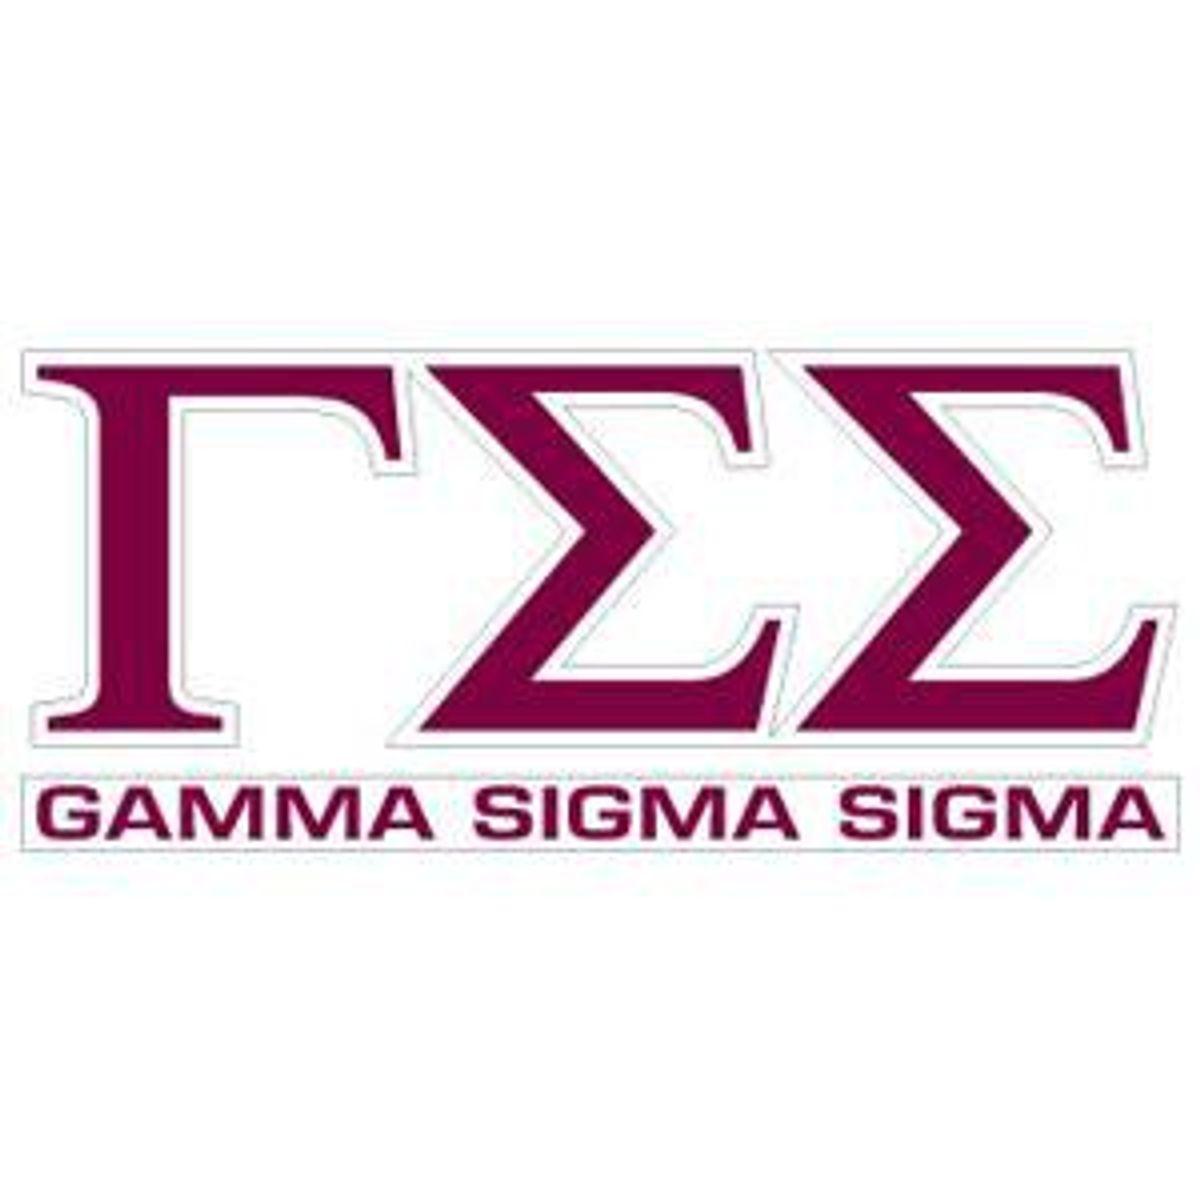 How I Really Miss Gamma Sigma Sigma